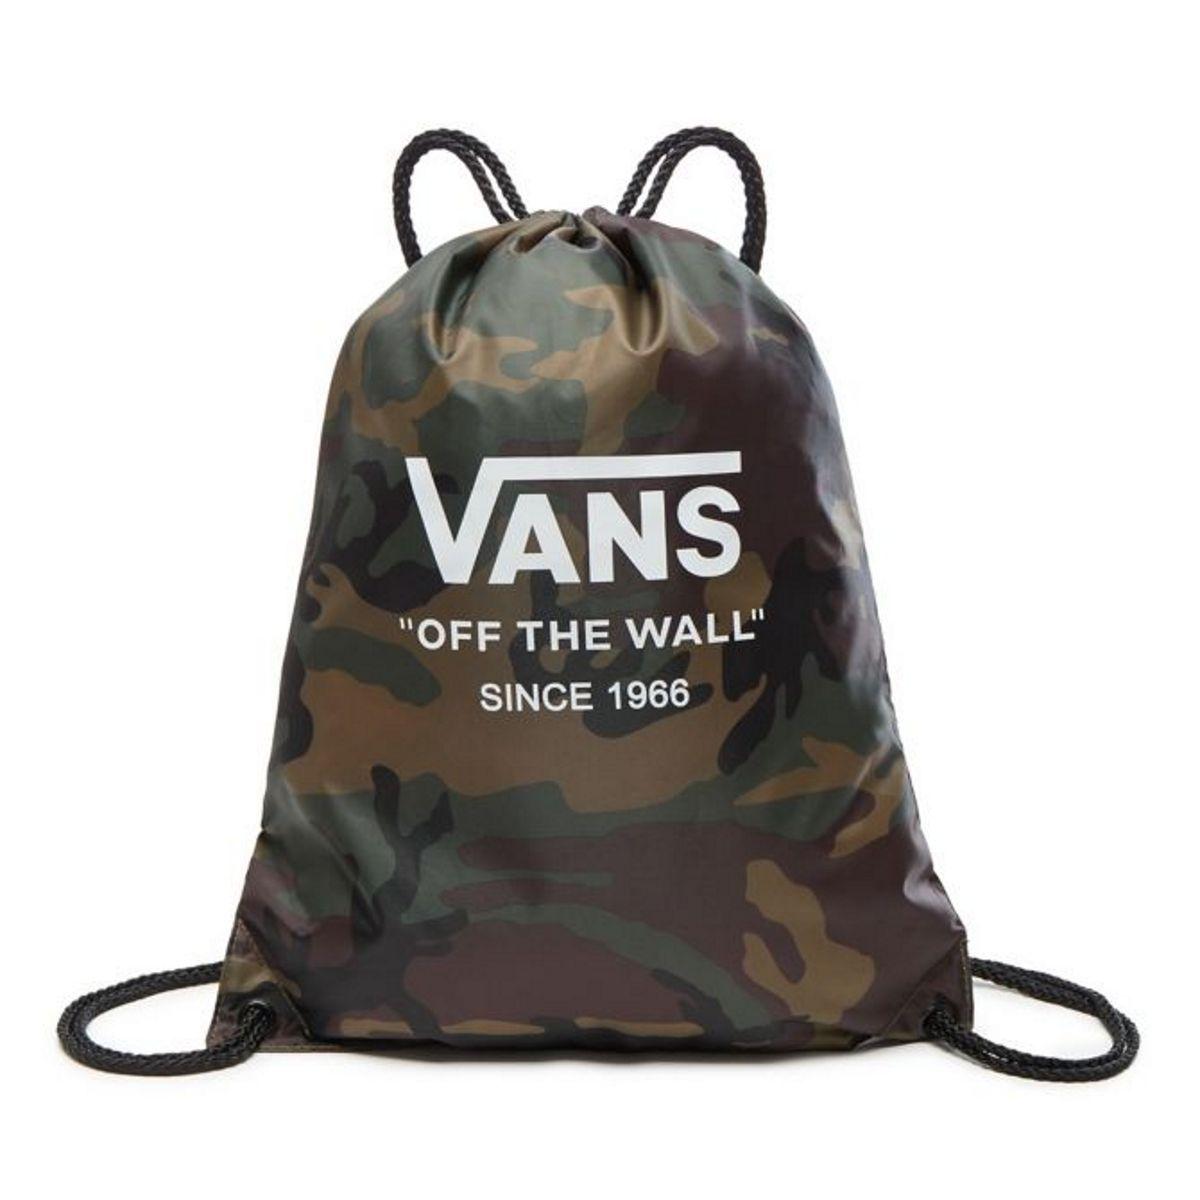 c74e55021174d vans camo/white bag | Accesories \ Backpacks Brands \ Vans | Skateshop  Miniramp.pl